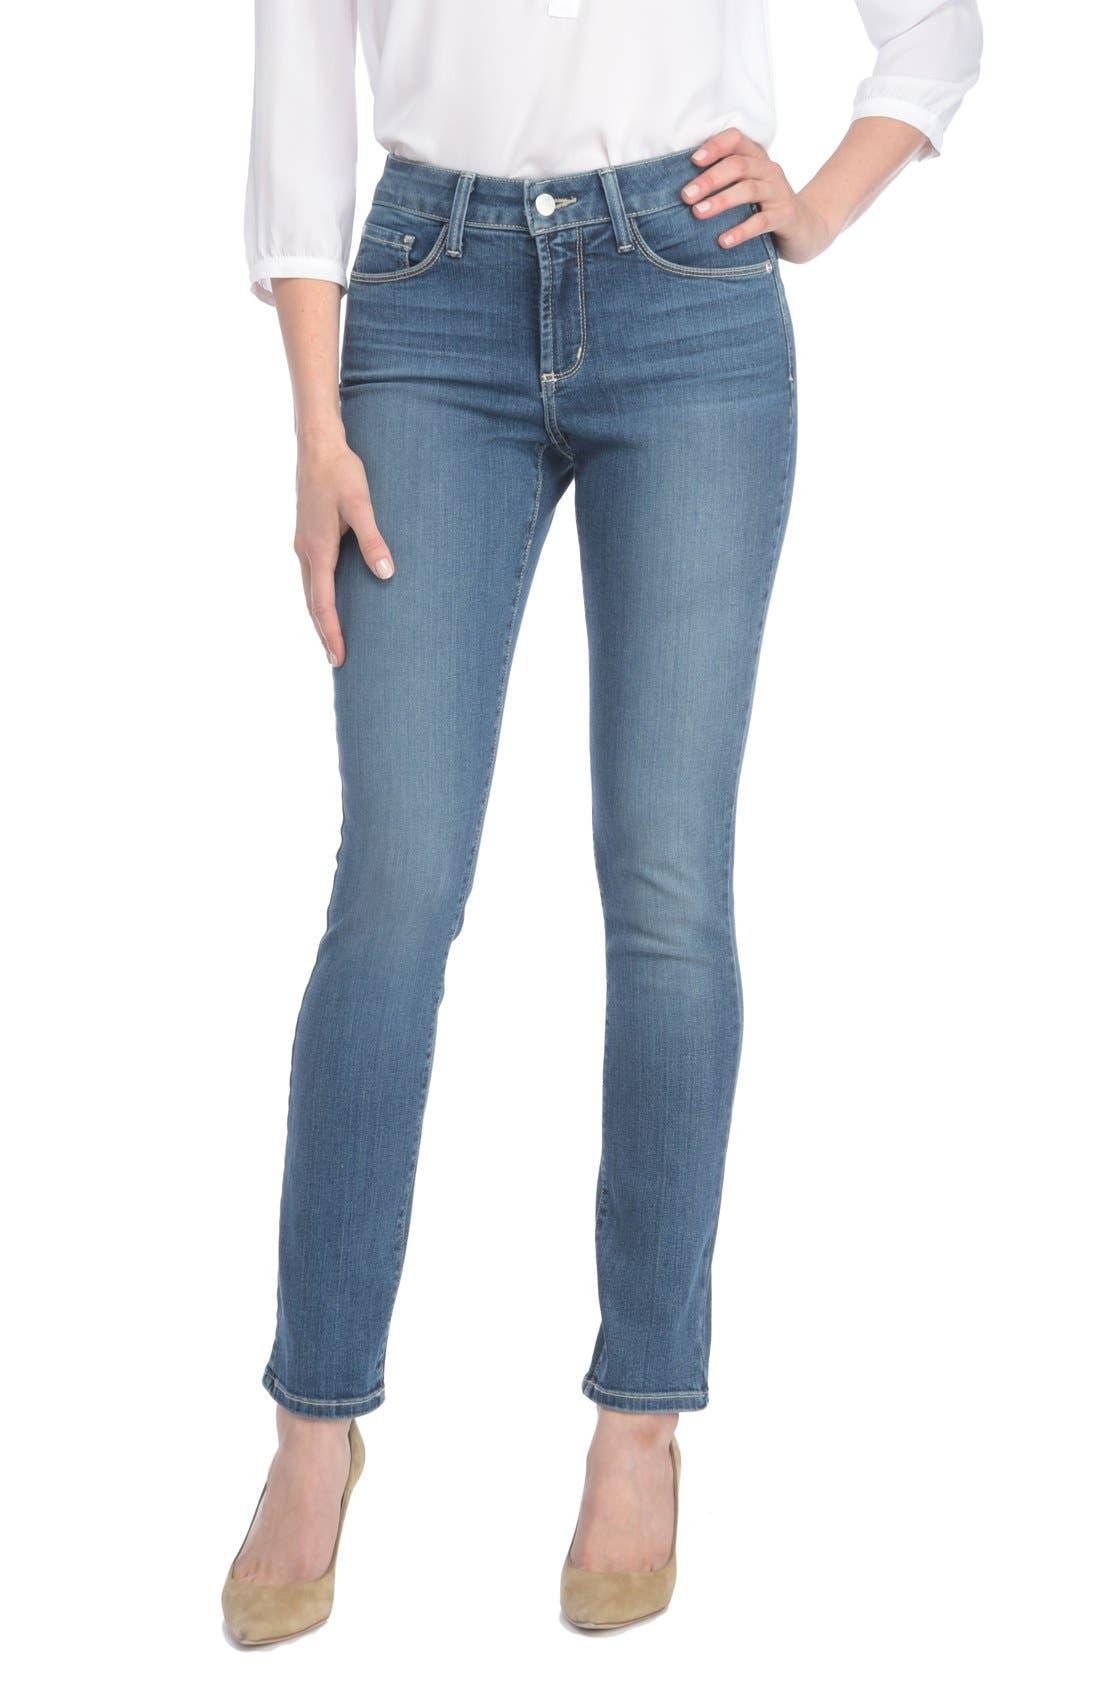 Main Image - NYDJ Alina Stretch Skinny Jeans (Heyburn) (Regular & Petite)